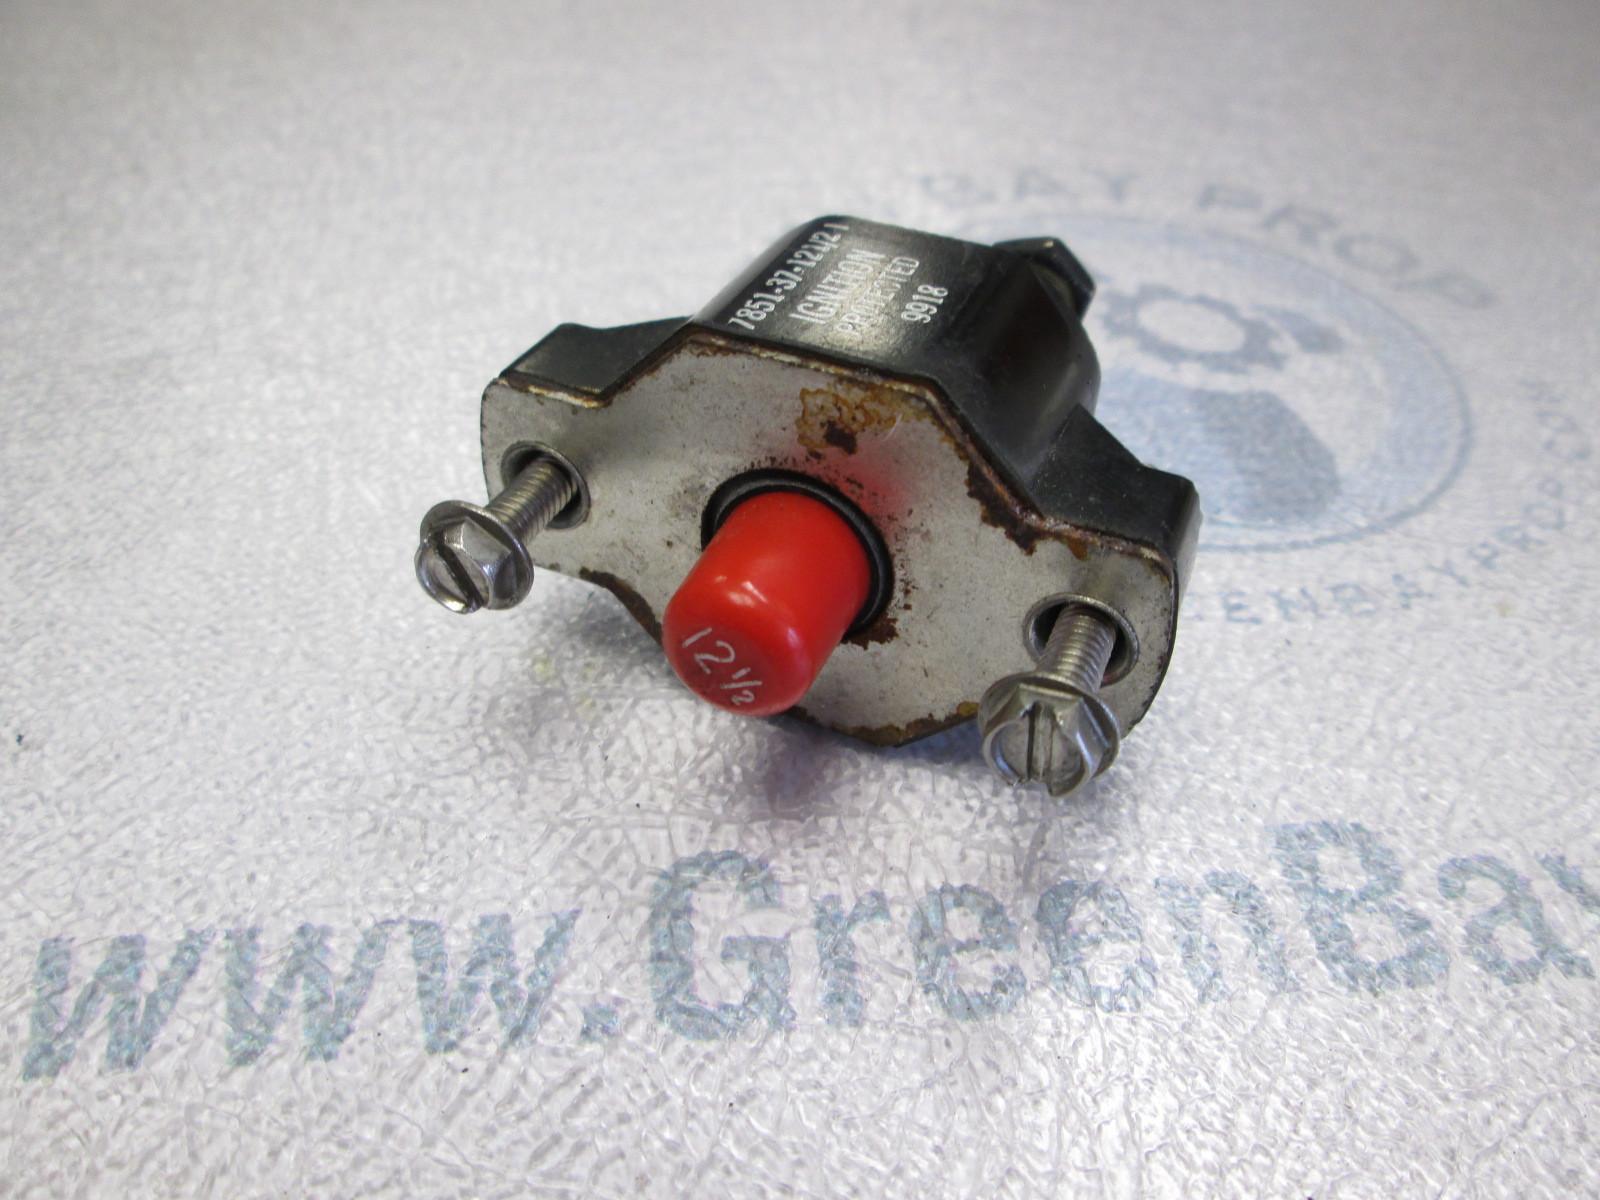 Volvo Penta 125 Amp Circuit Breaker Wiring Diagram Services 5 3854282 Sx Omc Cobra 12 Automatic Fuse Rh Ebay Com Ge Main Boating Electrical